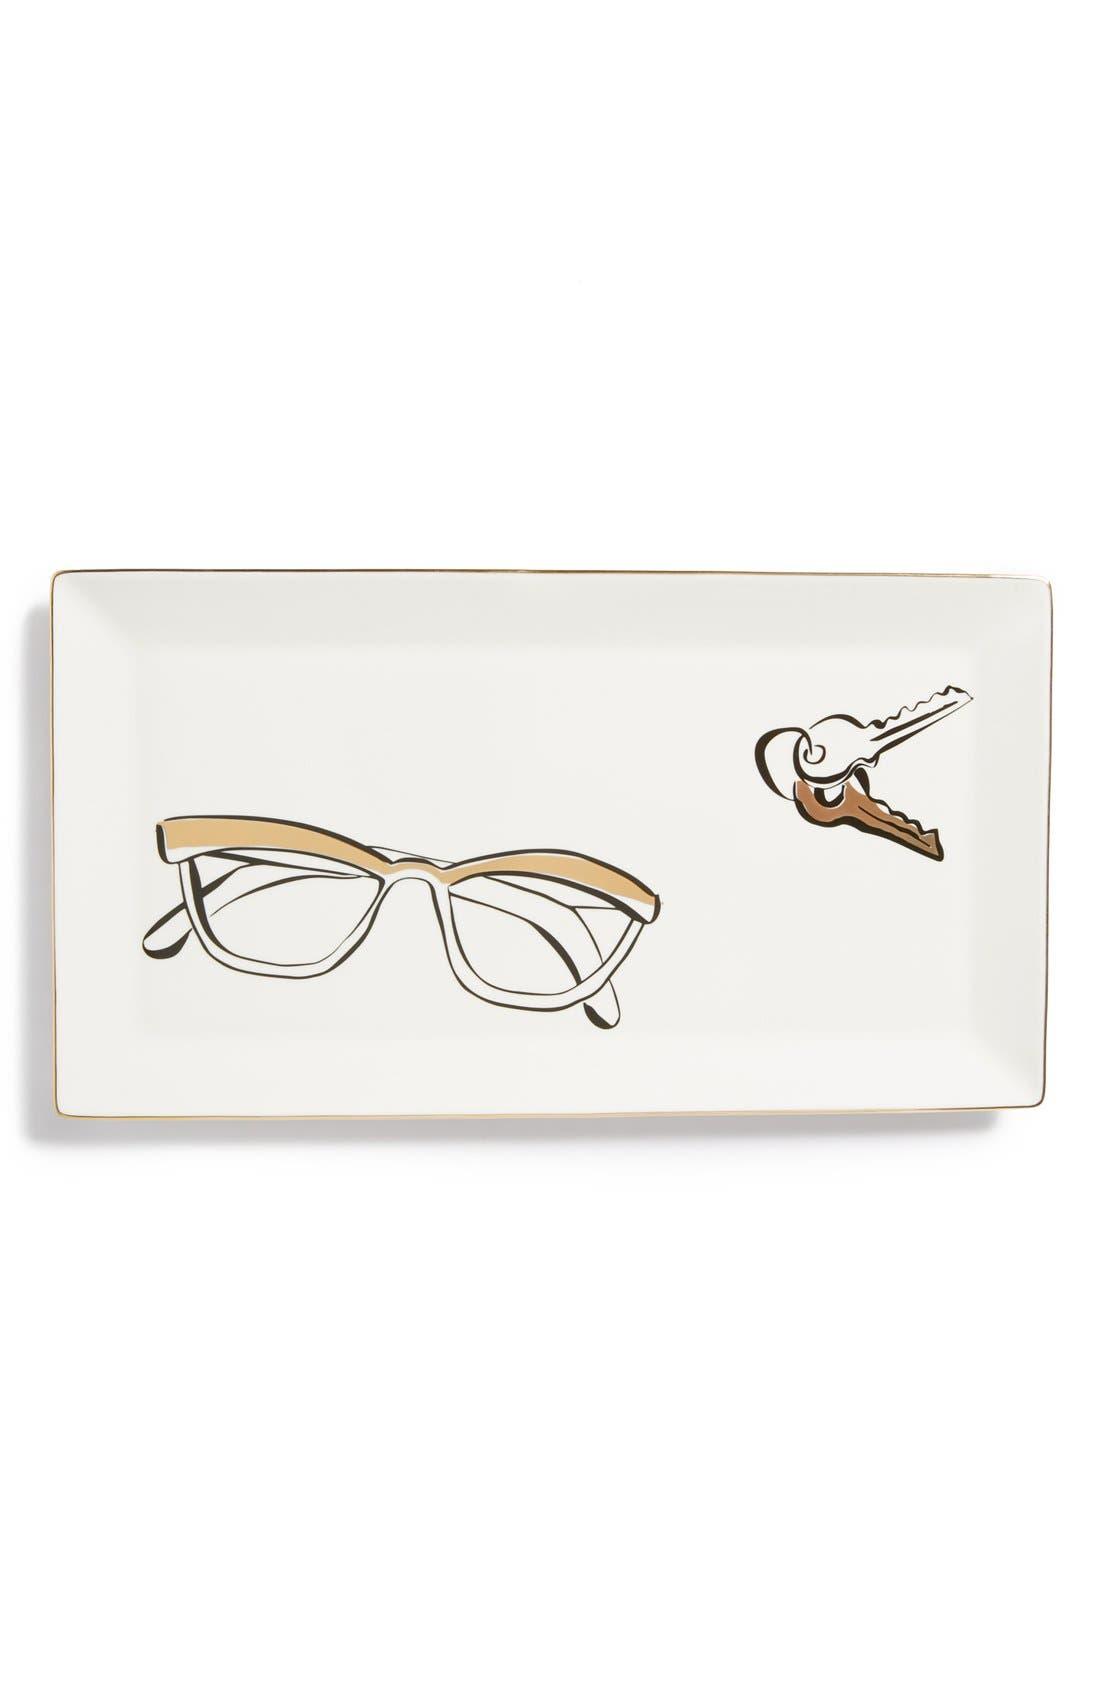 Alternate Image 1 Selected - kate spade new york 'eyeglasses' trinket tray